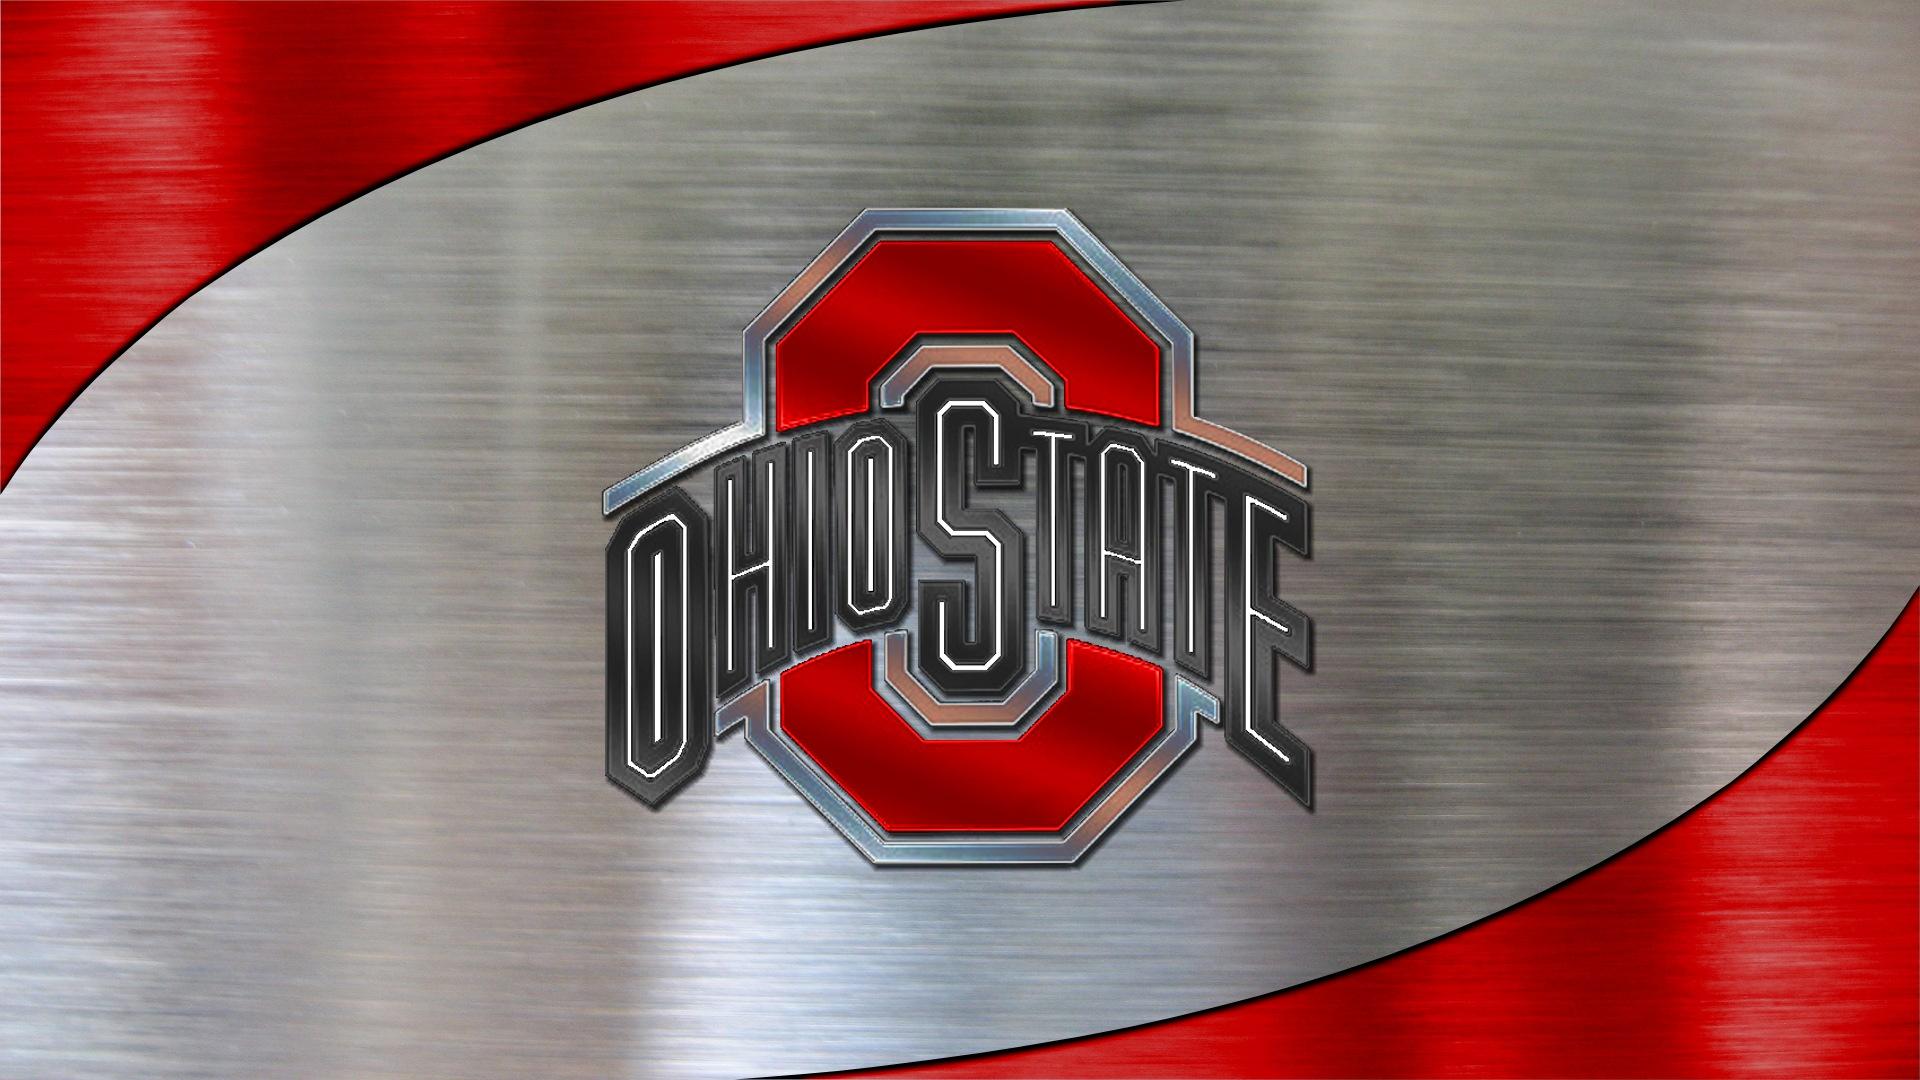 OSU Wallpaper 675   Ohio State Football Wallpaper 34246917 1920x1080